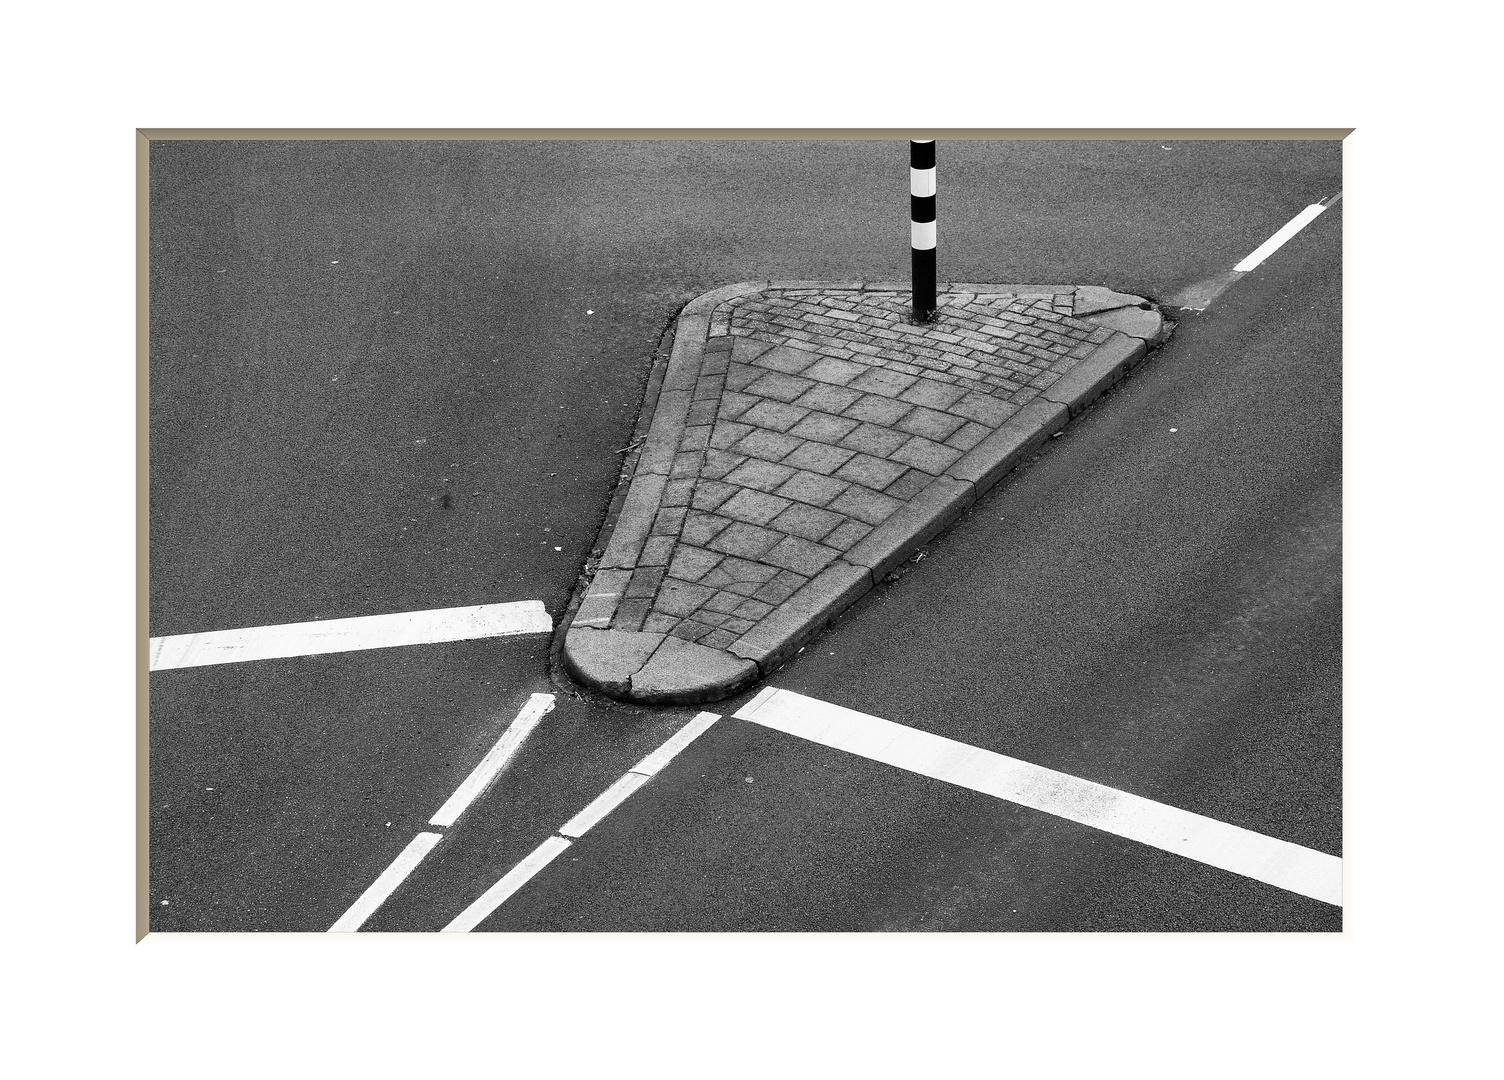 Geometrics (Maastricht #2)